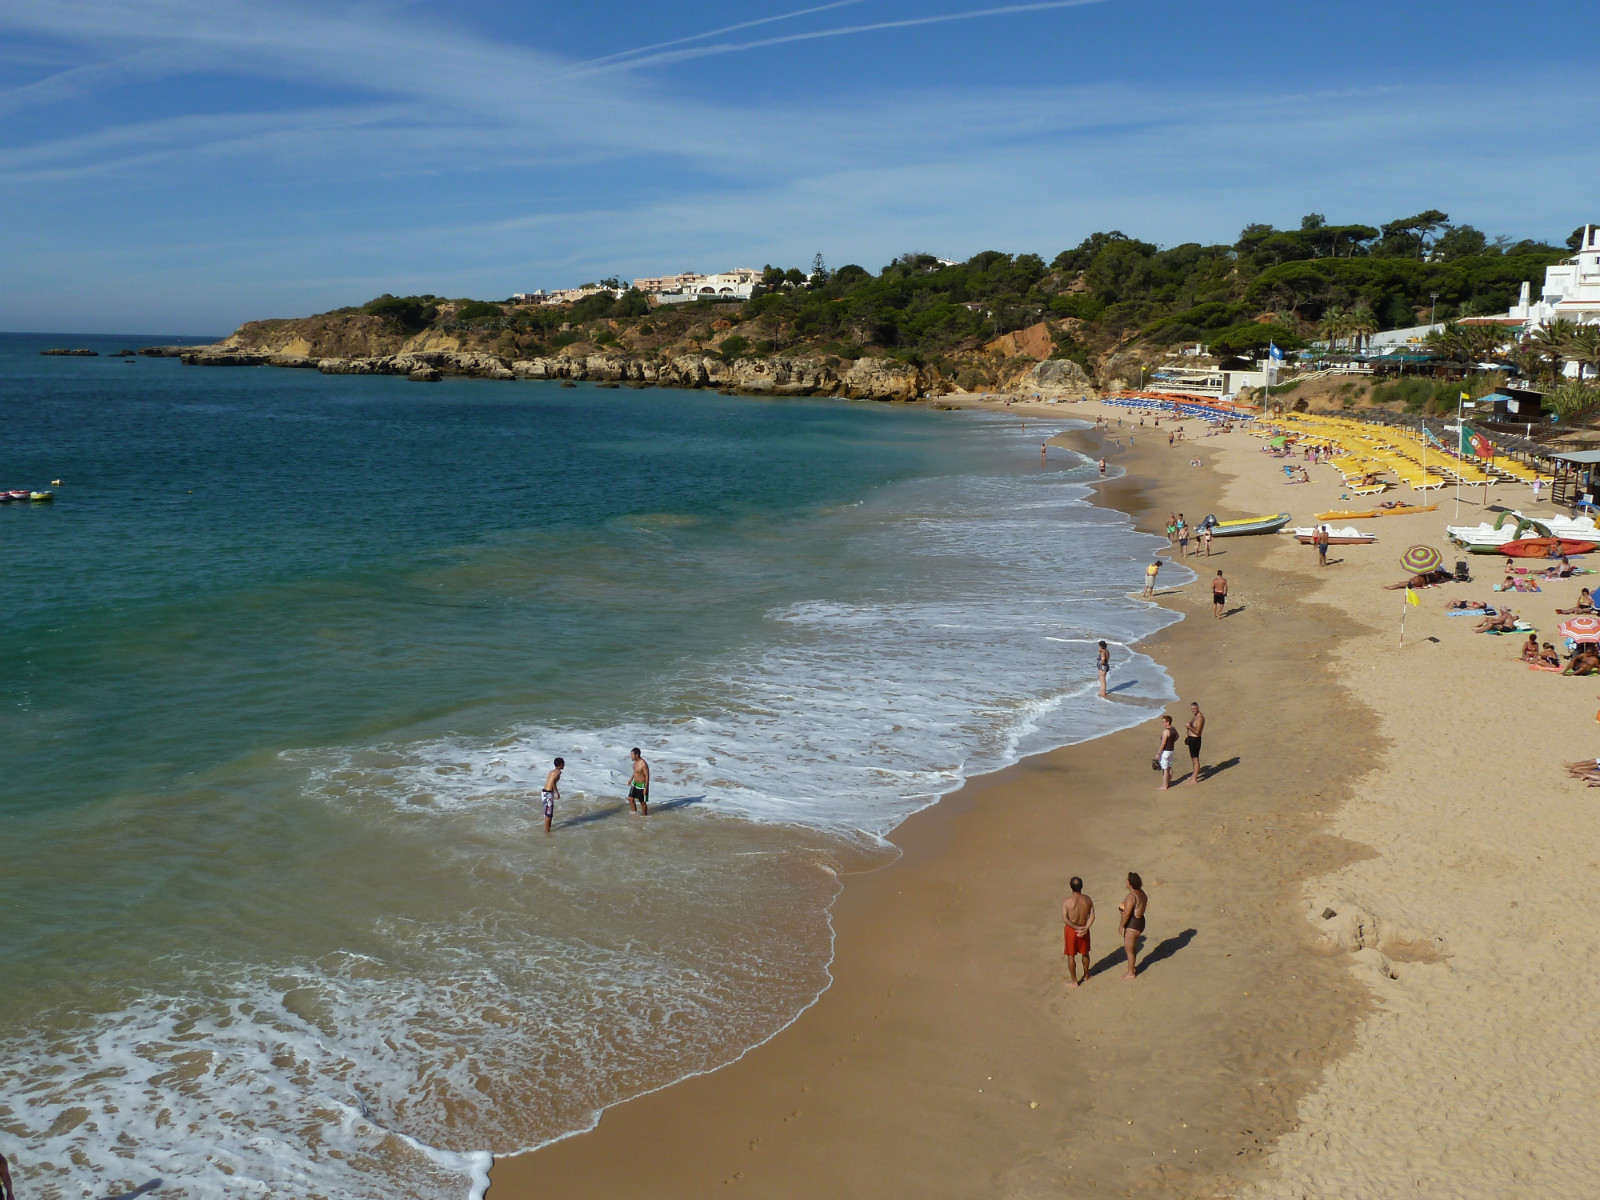 Praia da Oura: Another local, beautiful, picture postcard 'Blue Flag Beach'.